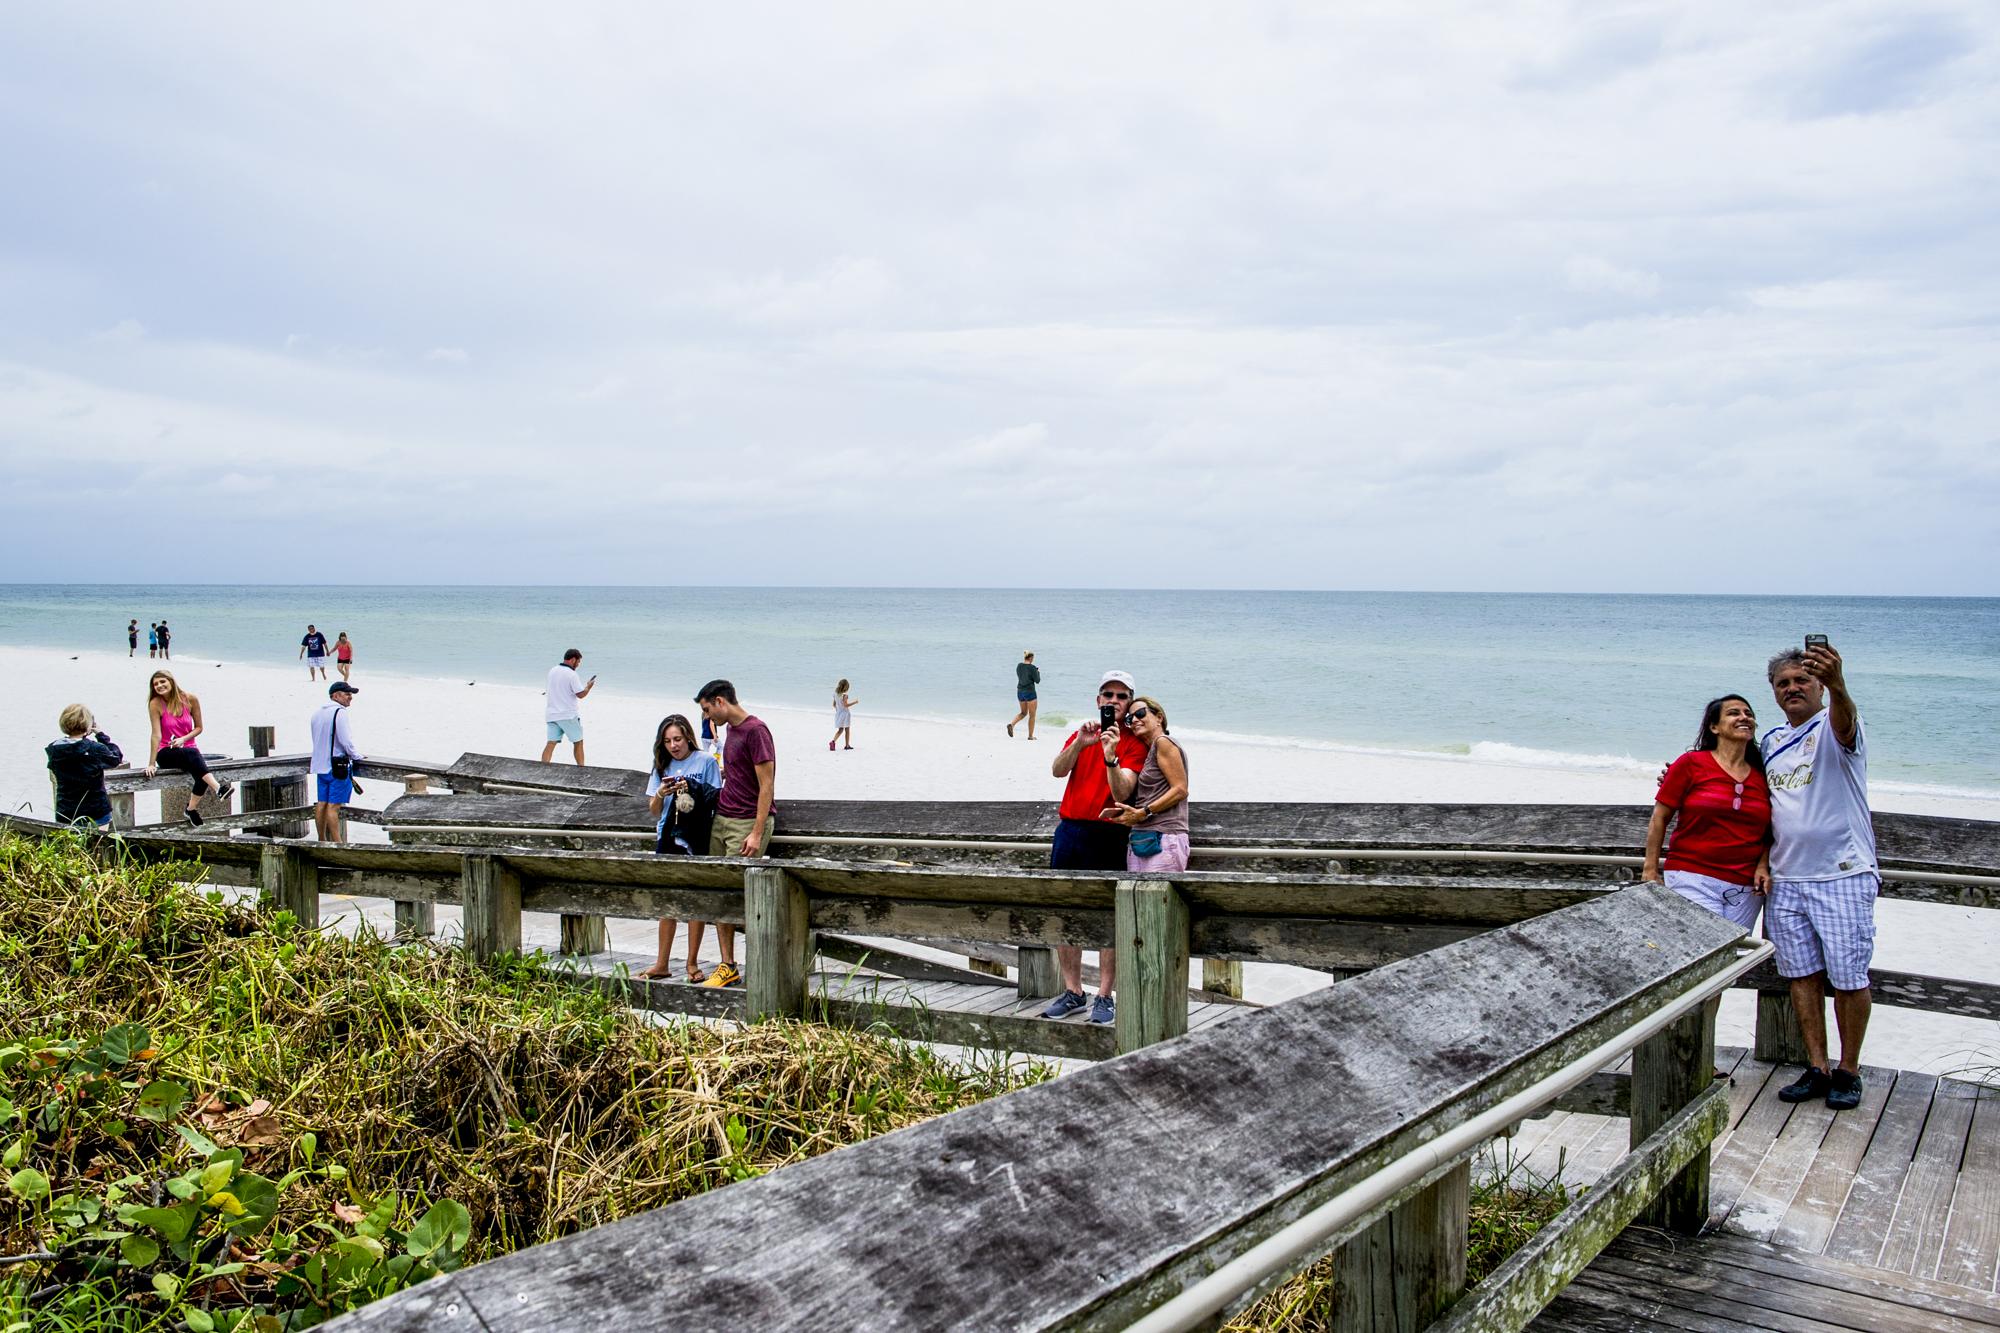 Many people visited Vanderbilt Beach in north Naples hours before Irma hit.